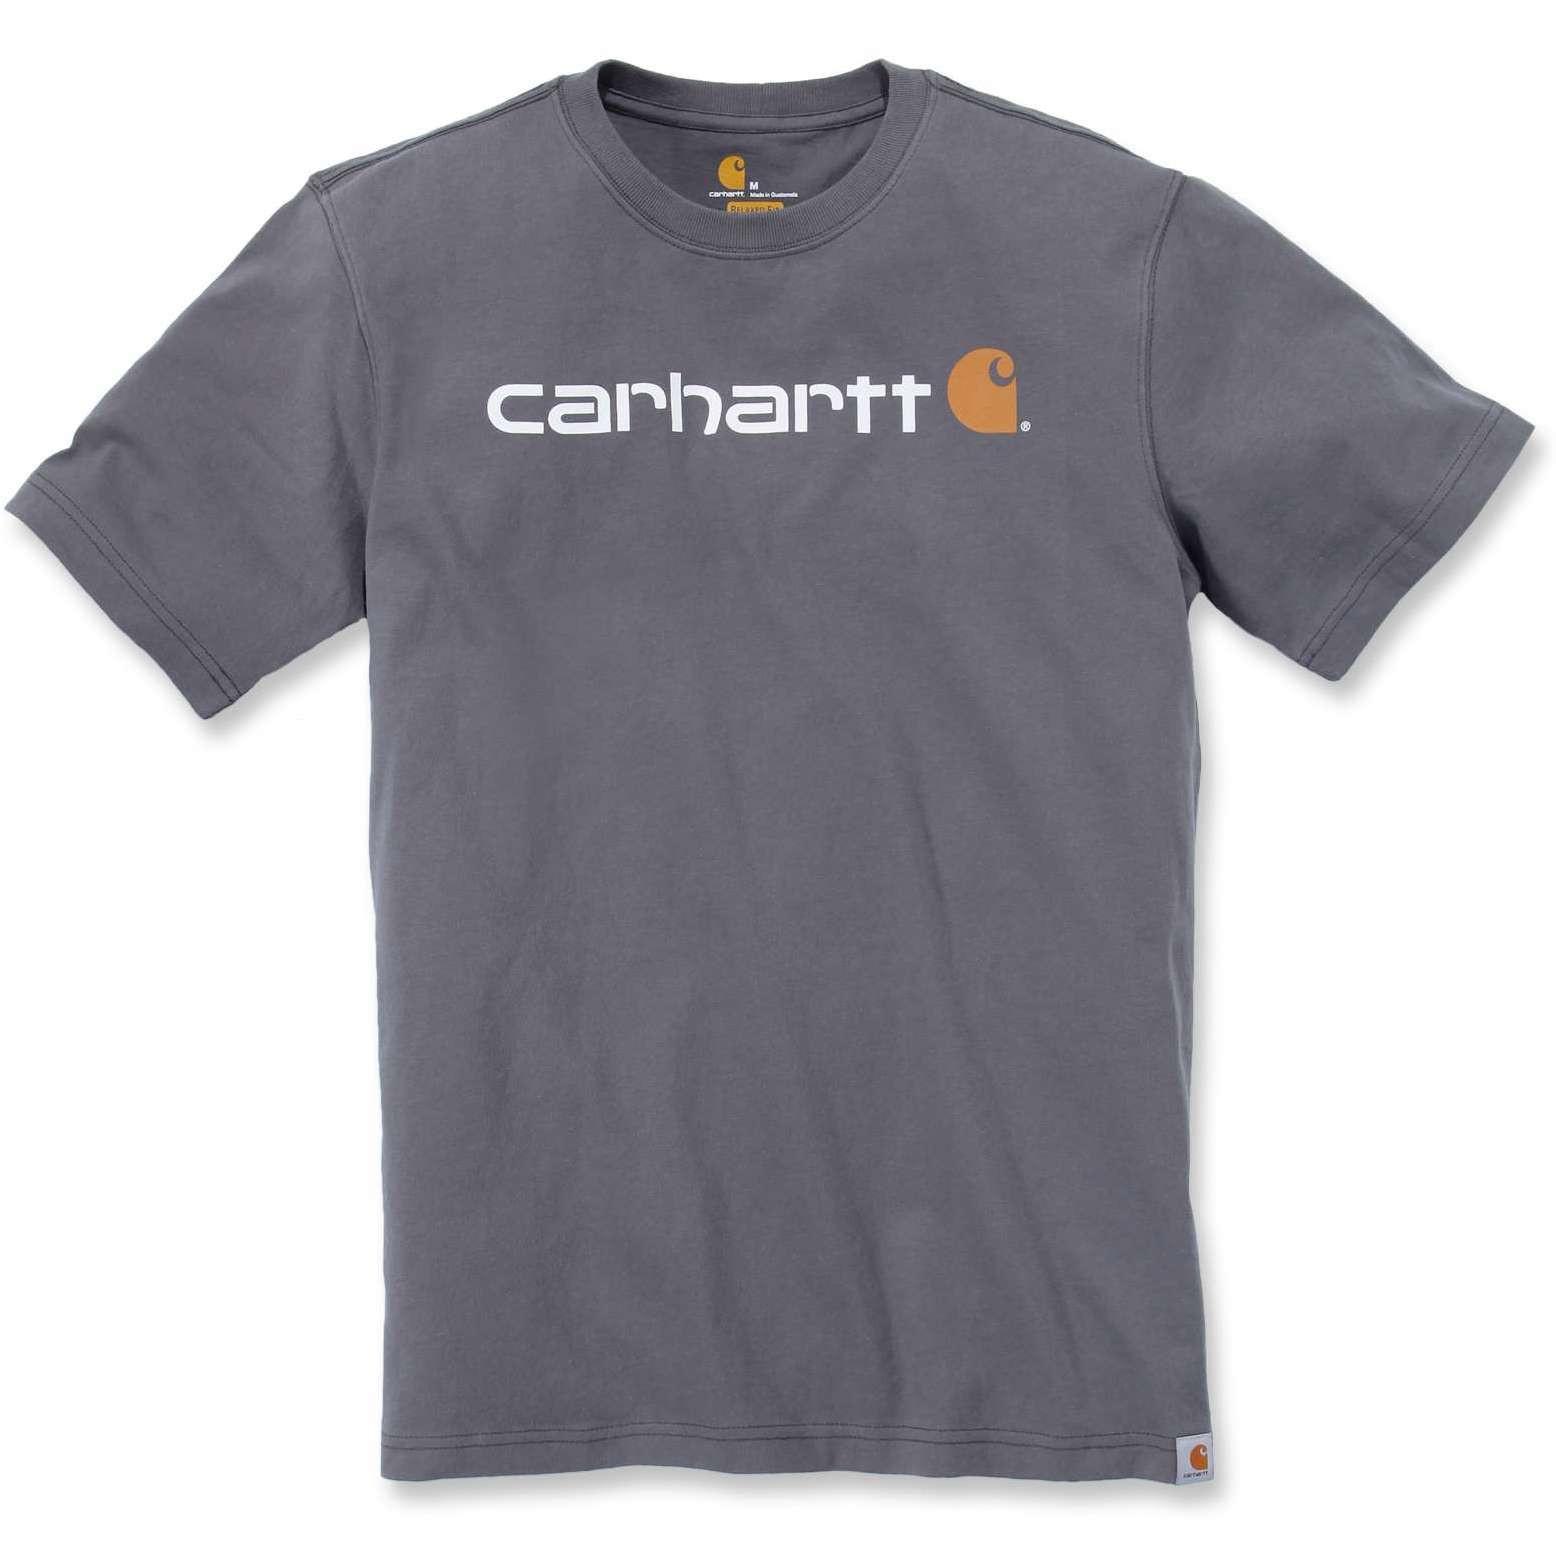 Футболка Carhartt Core Logo T-Shirt S/S 103361 (Charcoal)